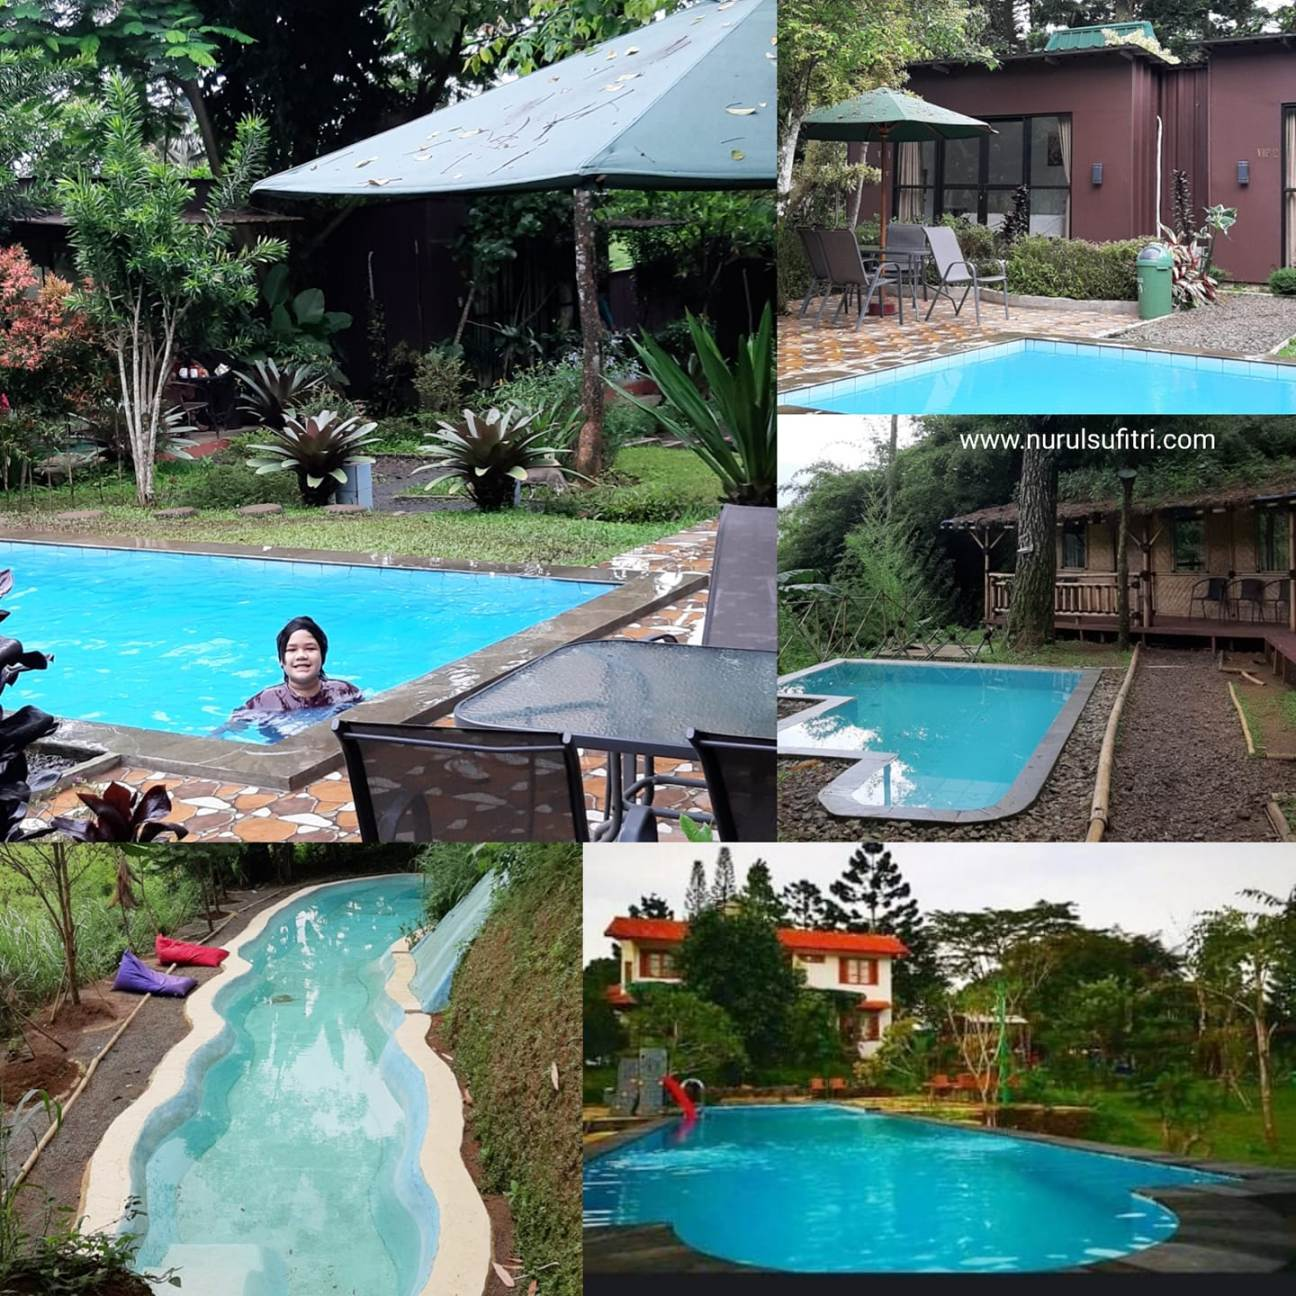 pengalaman pertama menginap di cabin vip the forest cisarua nurul sufitri travel lifestyle blog